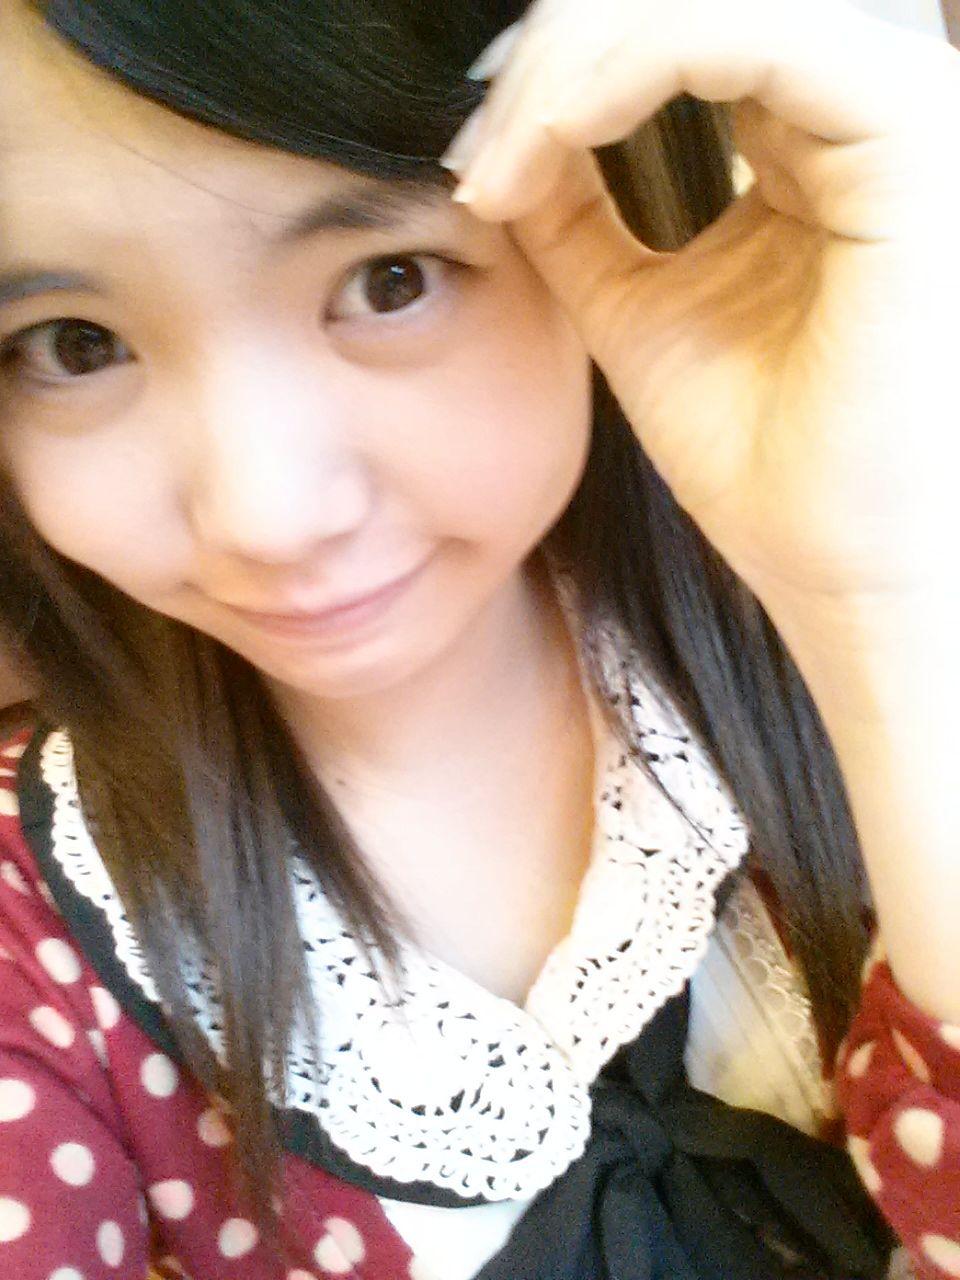 http://livedoor.blogimg.jp/otohaeika/imgs/2/4/24c461bd.jpg